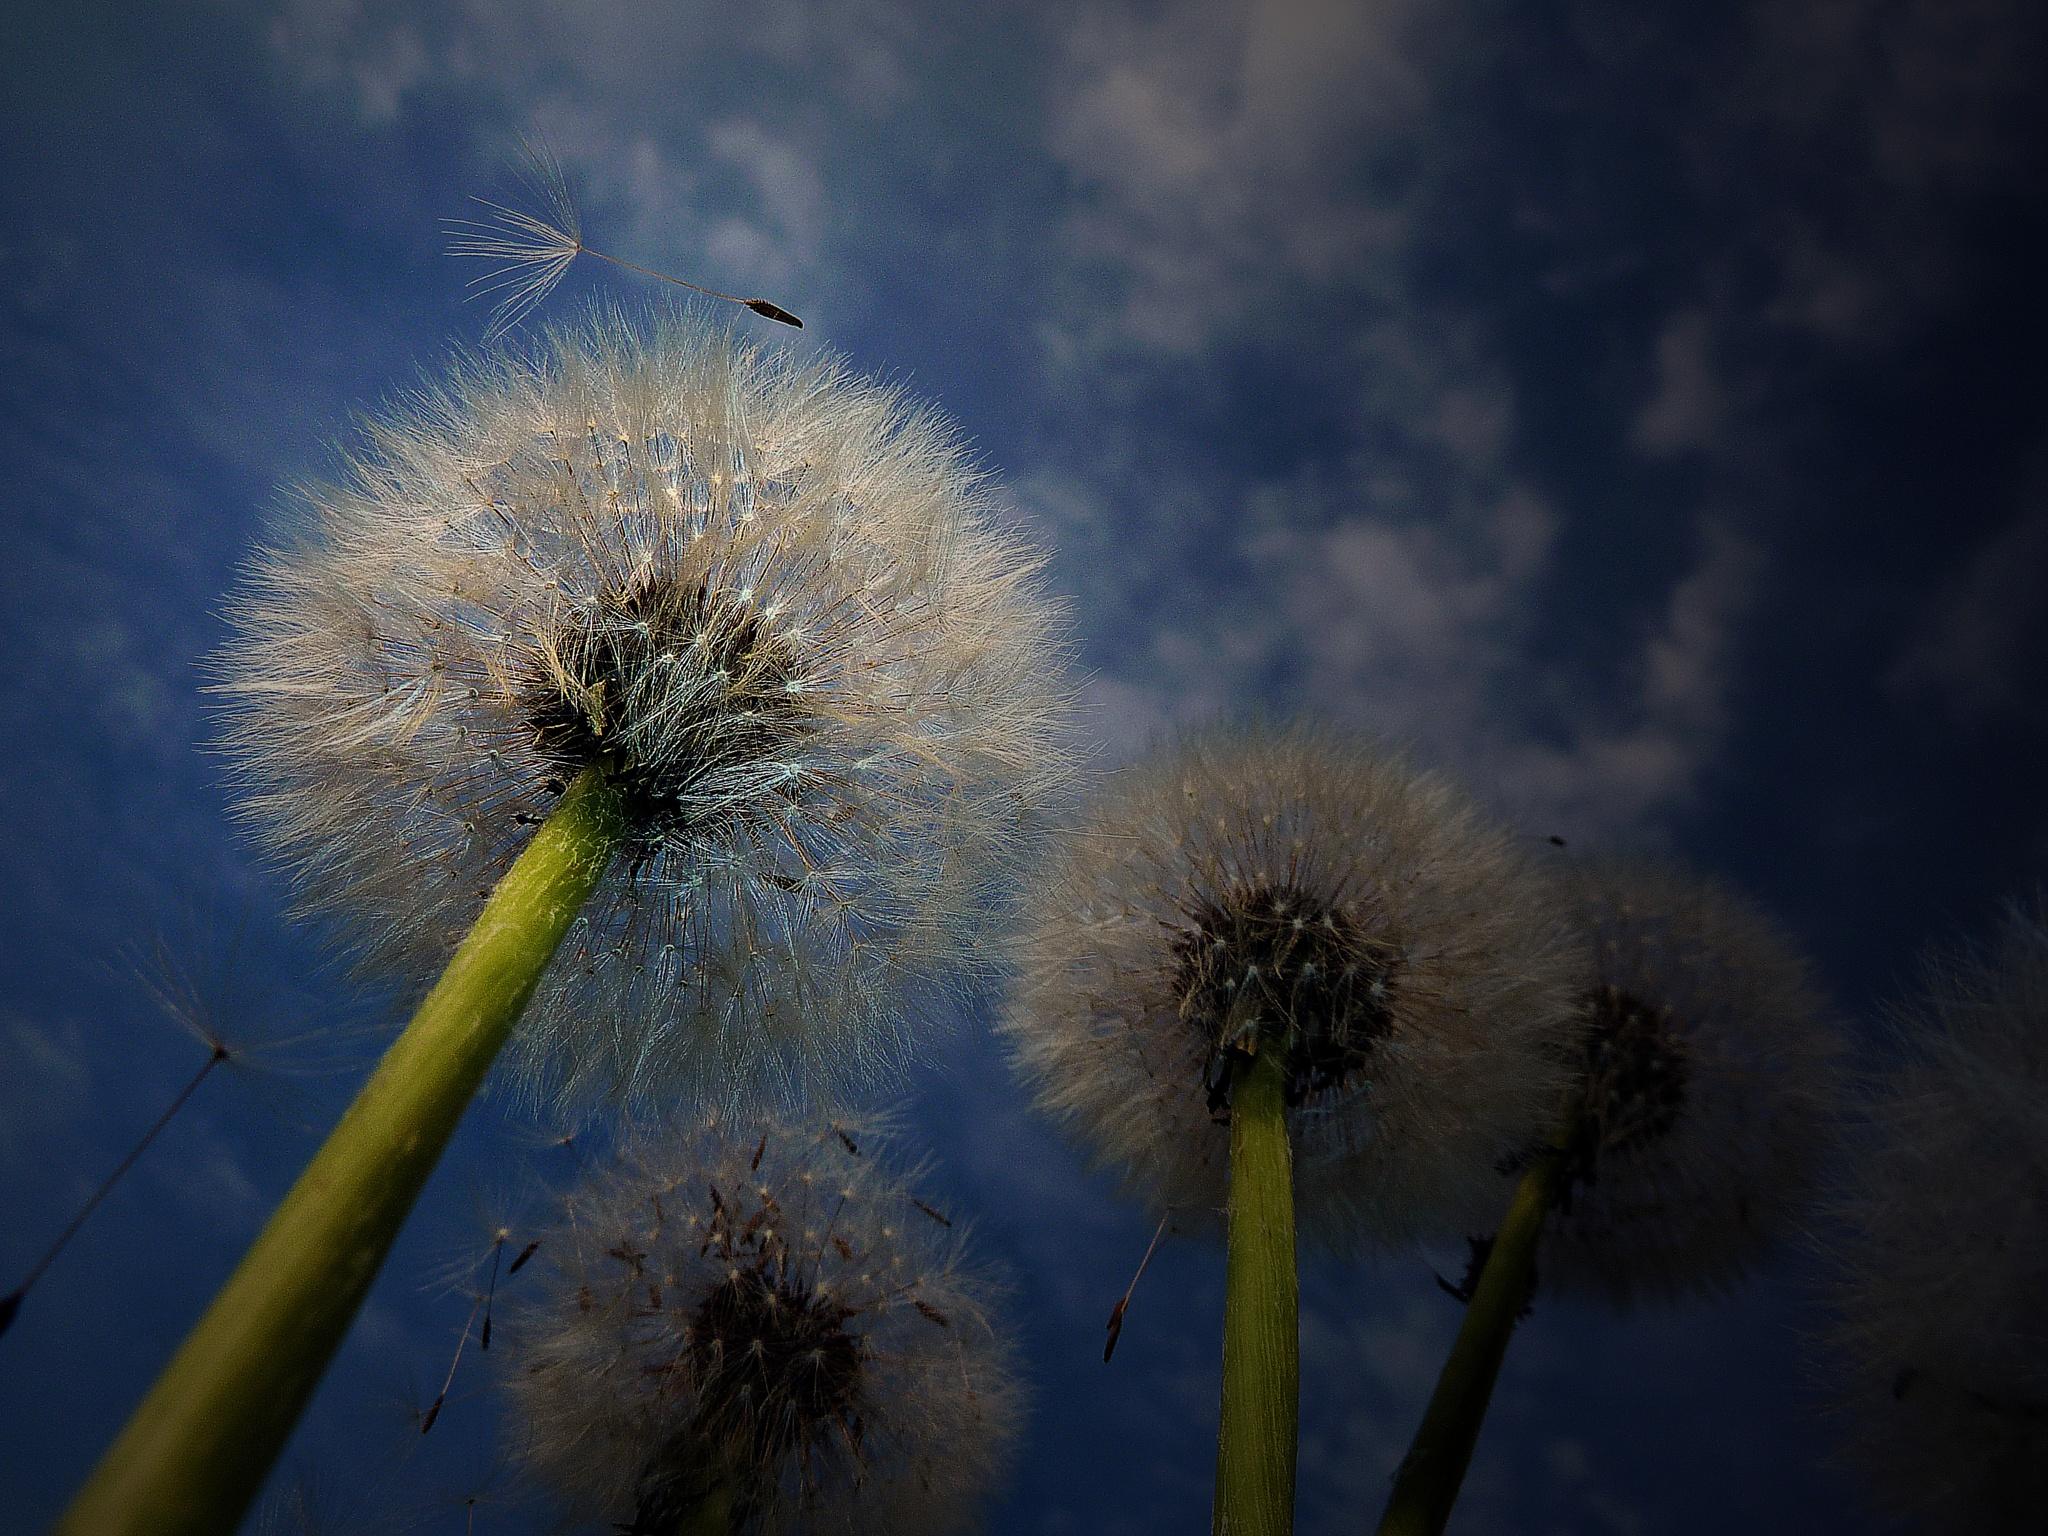 dandelion in light by Aleph61